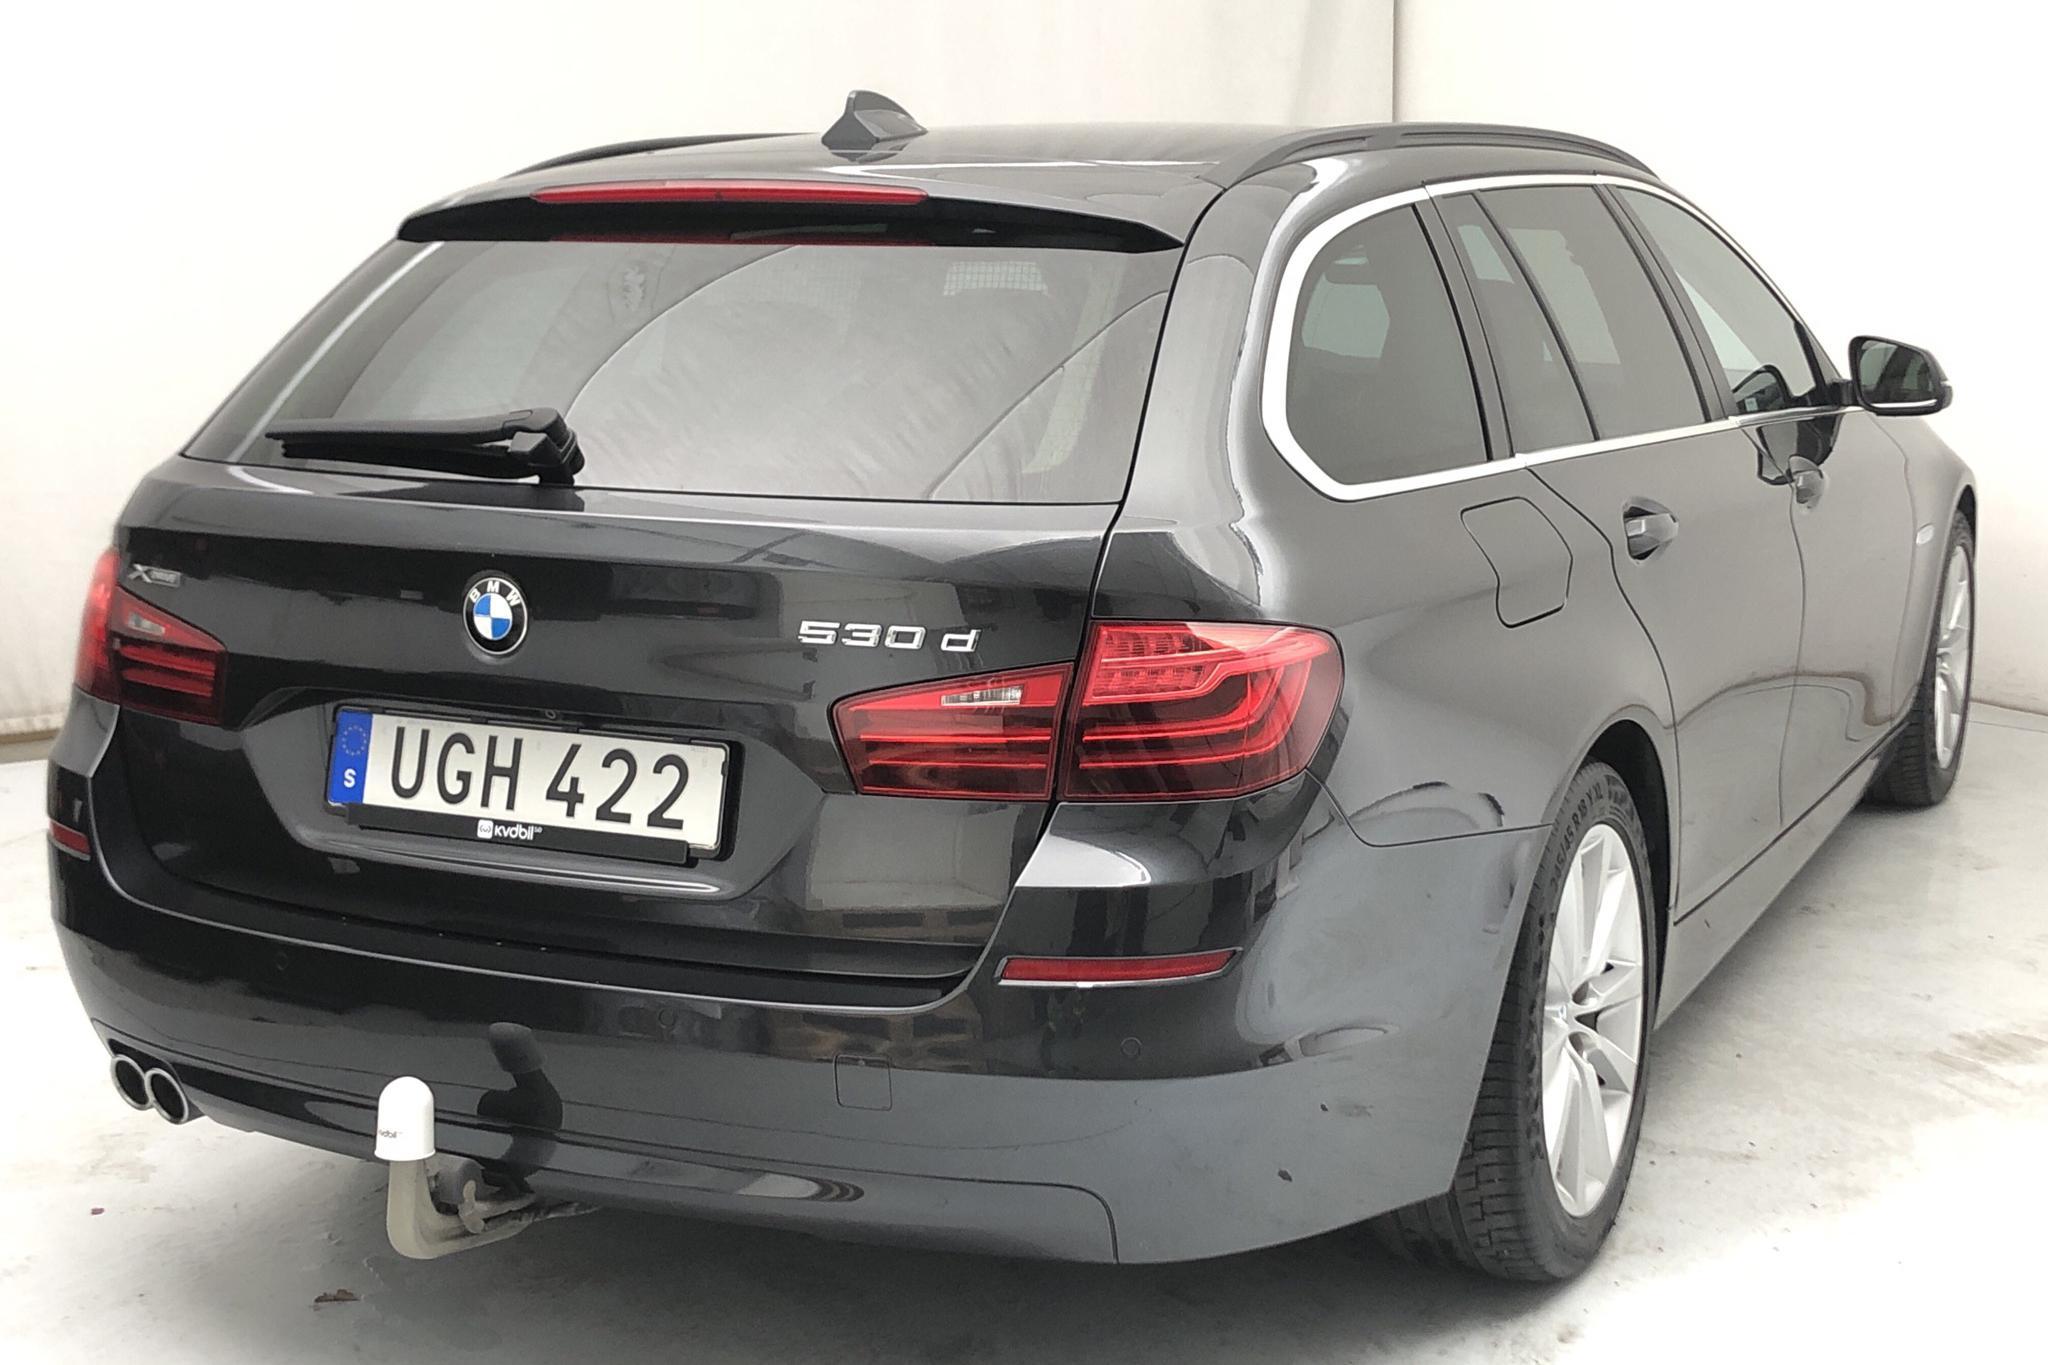 BMW 530d xDrive Touring, F11 (258hk) - 10 017 mil - Automat - grå - 2017